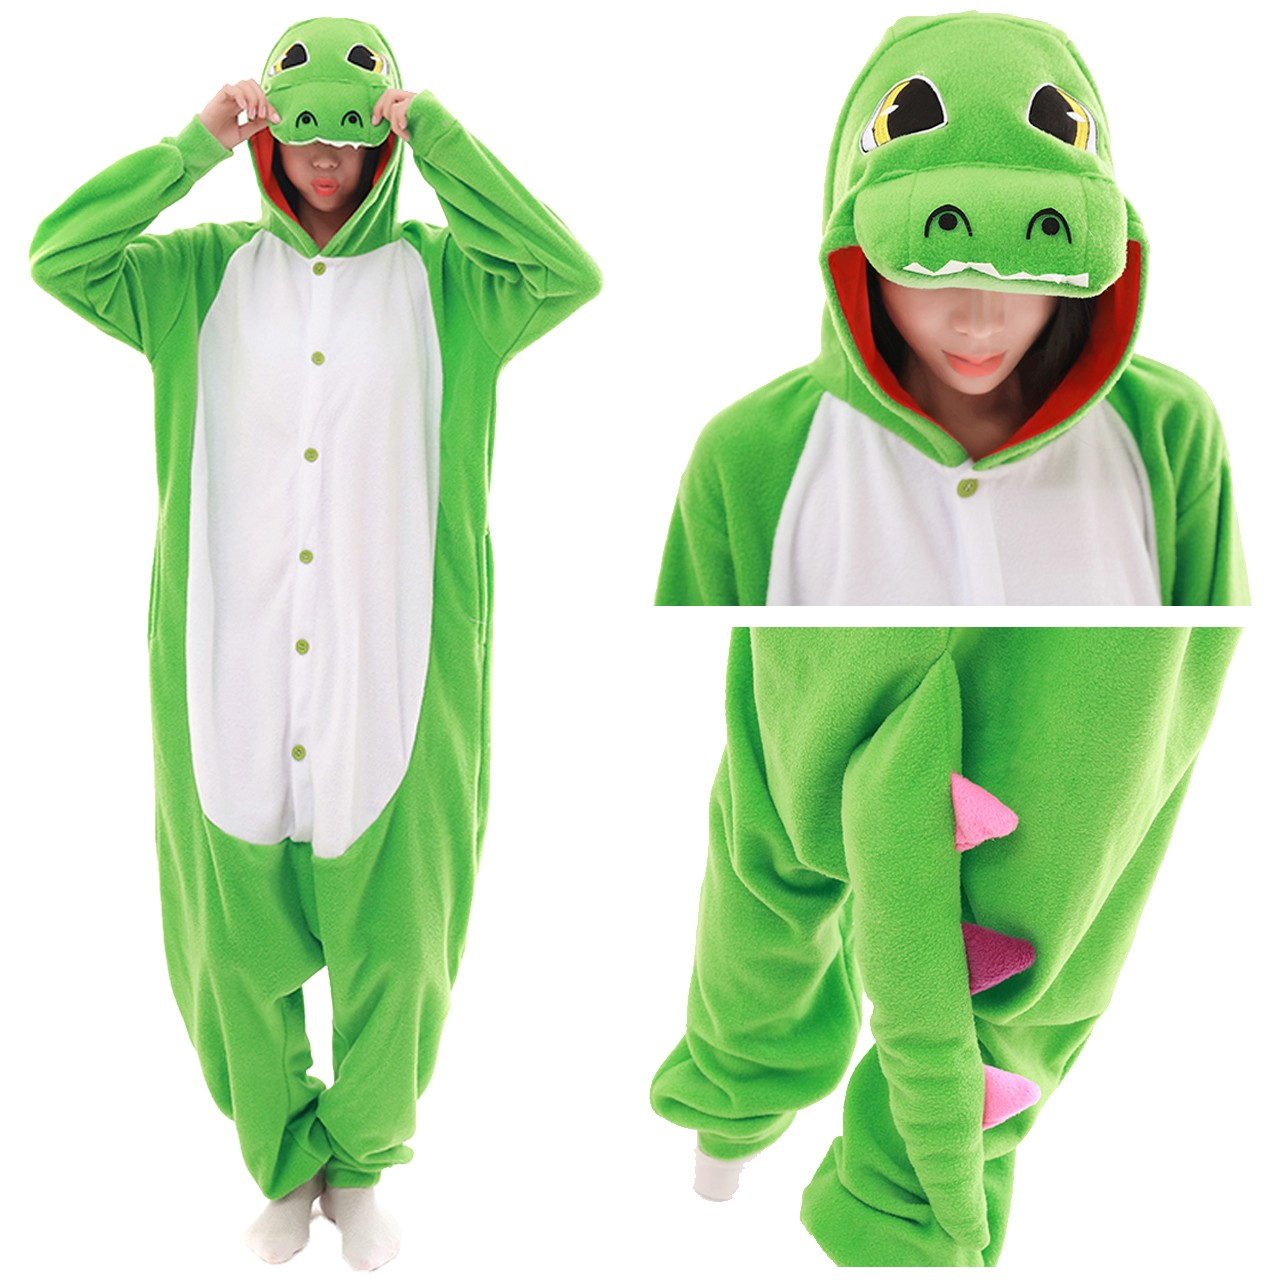 86cf05c8d8a1 Green Crocodile Onesie Animal Kigurumi Pajama Women   Men Halloween  Carnival Costumes